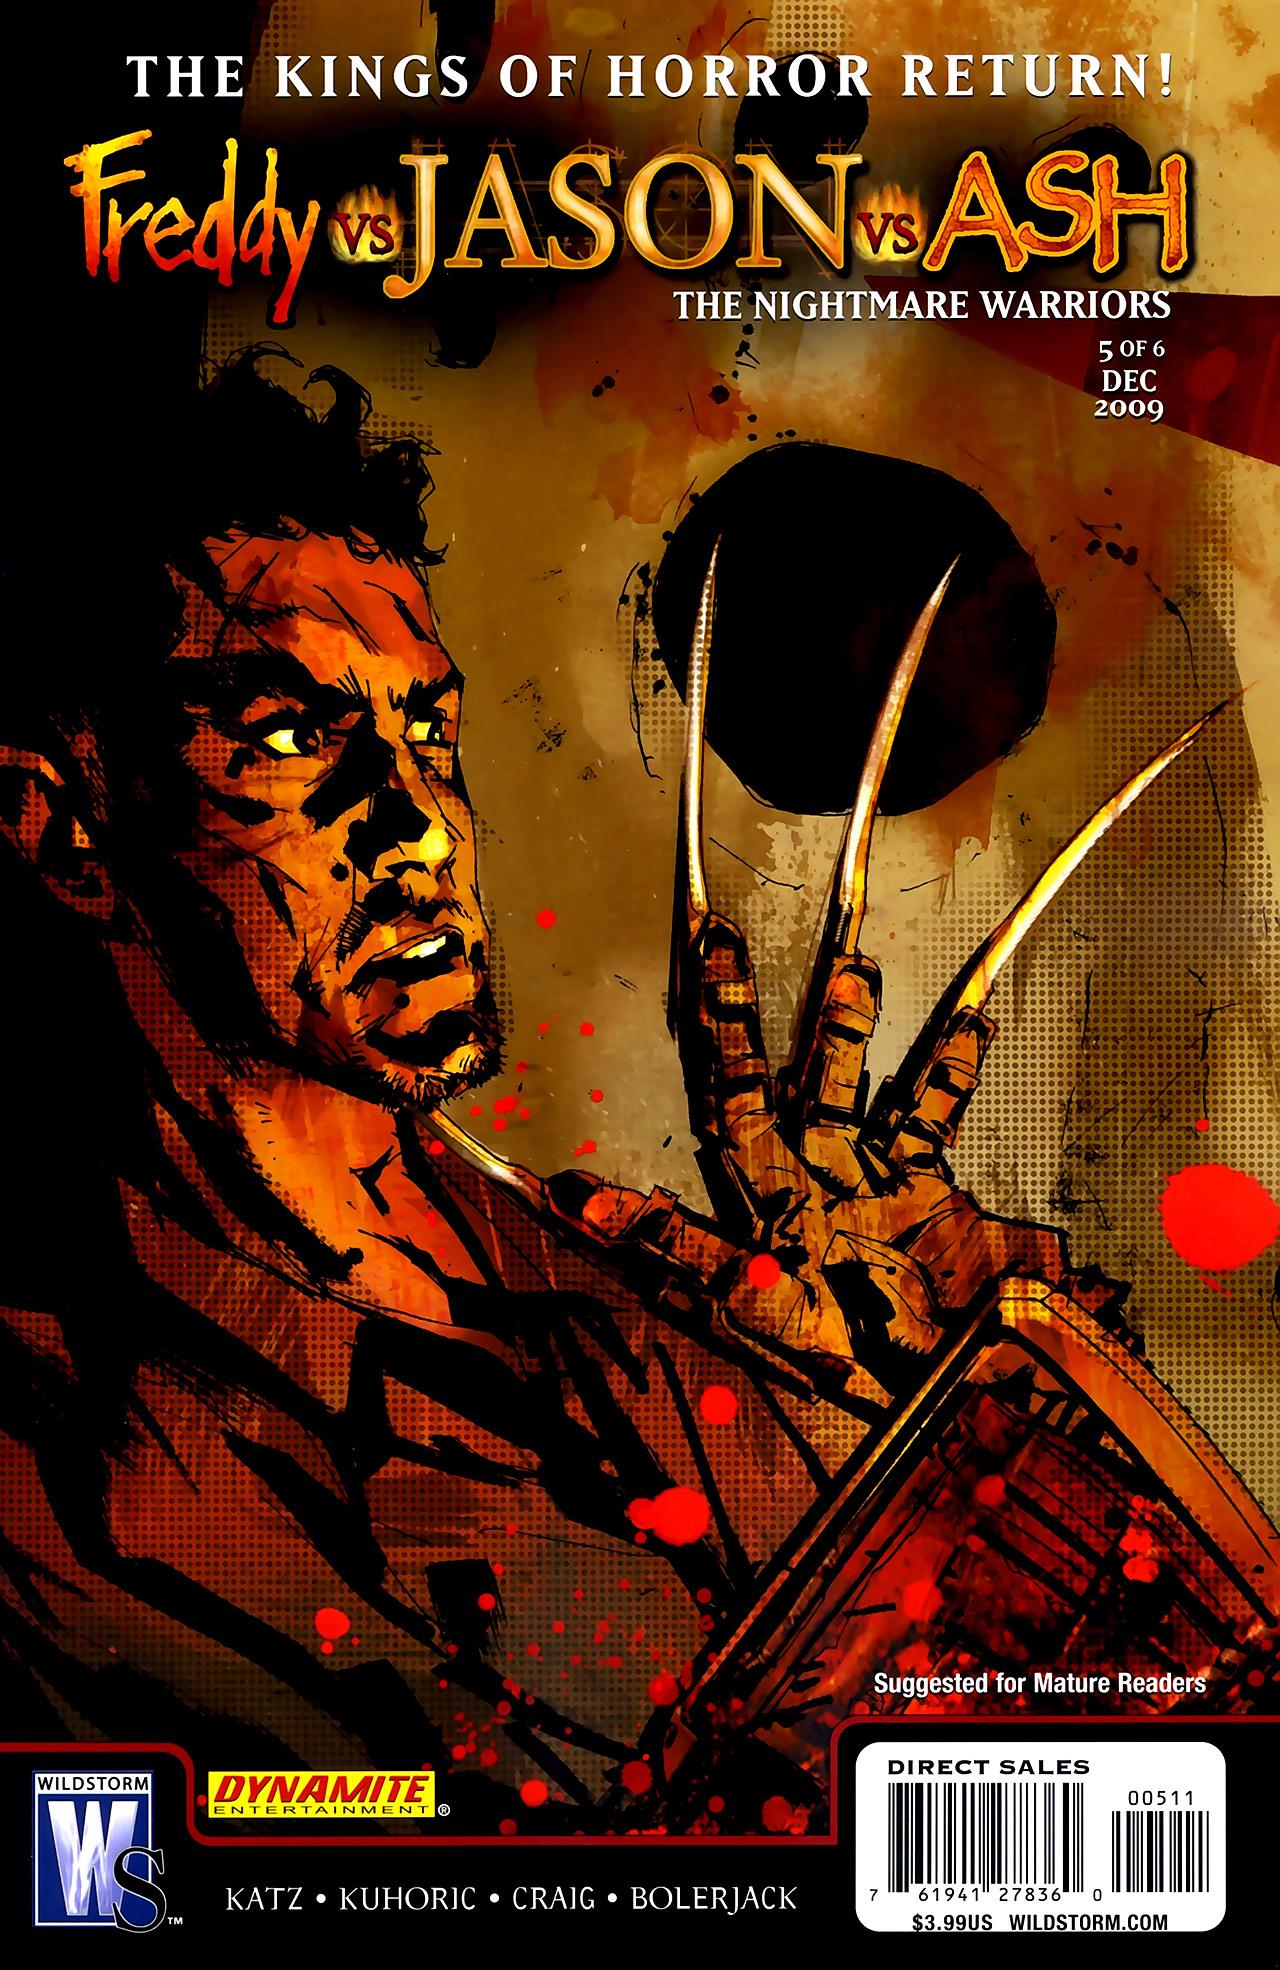 Freddy vs. Jason vs. Ash: The Nightmare Warriors 5 Page 1